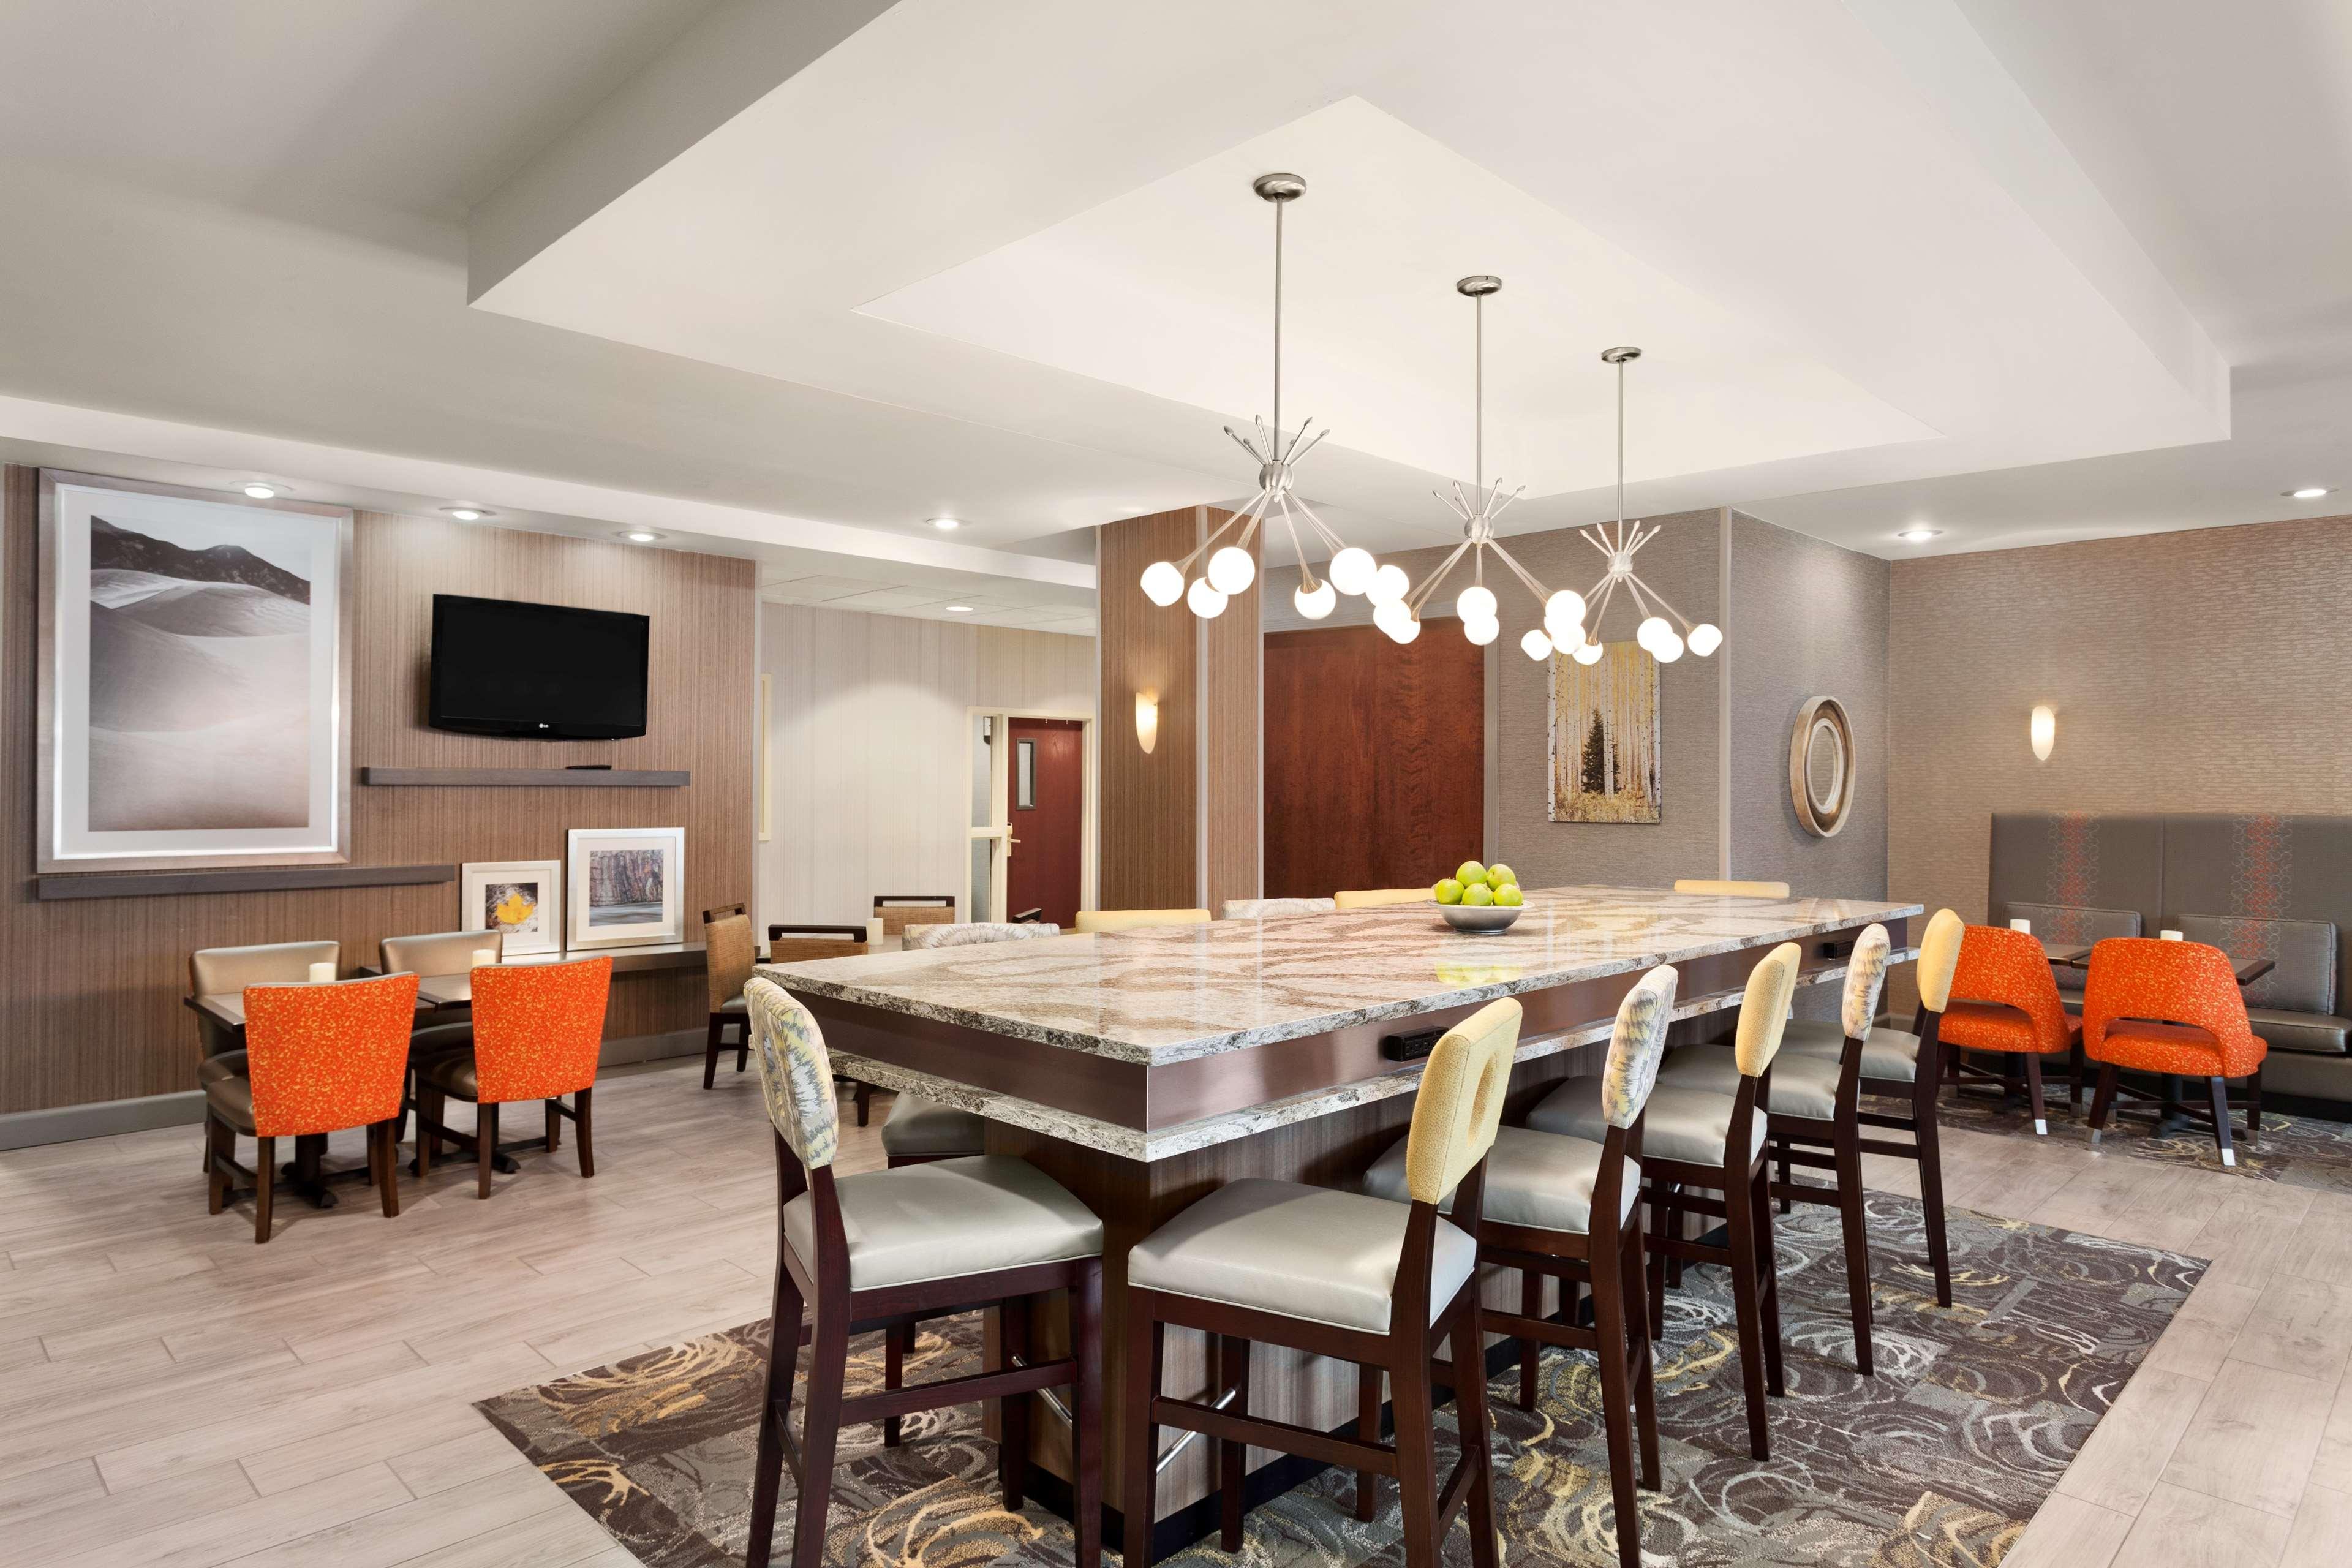 Hampton Inn & Suites Denver-Cherry Creek image 3